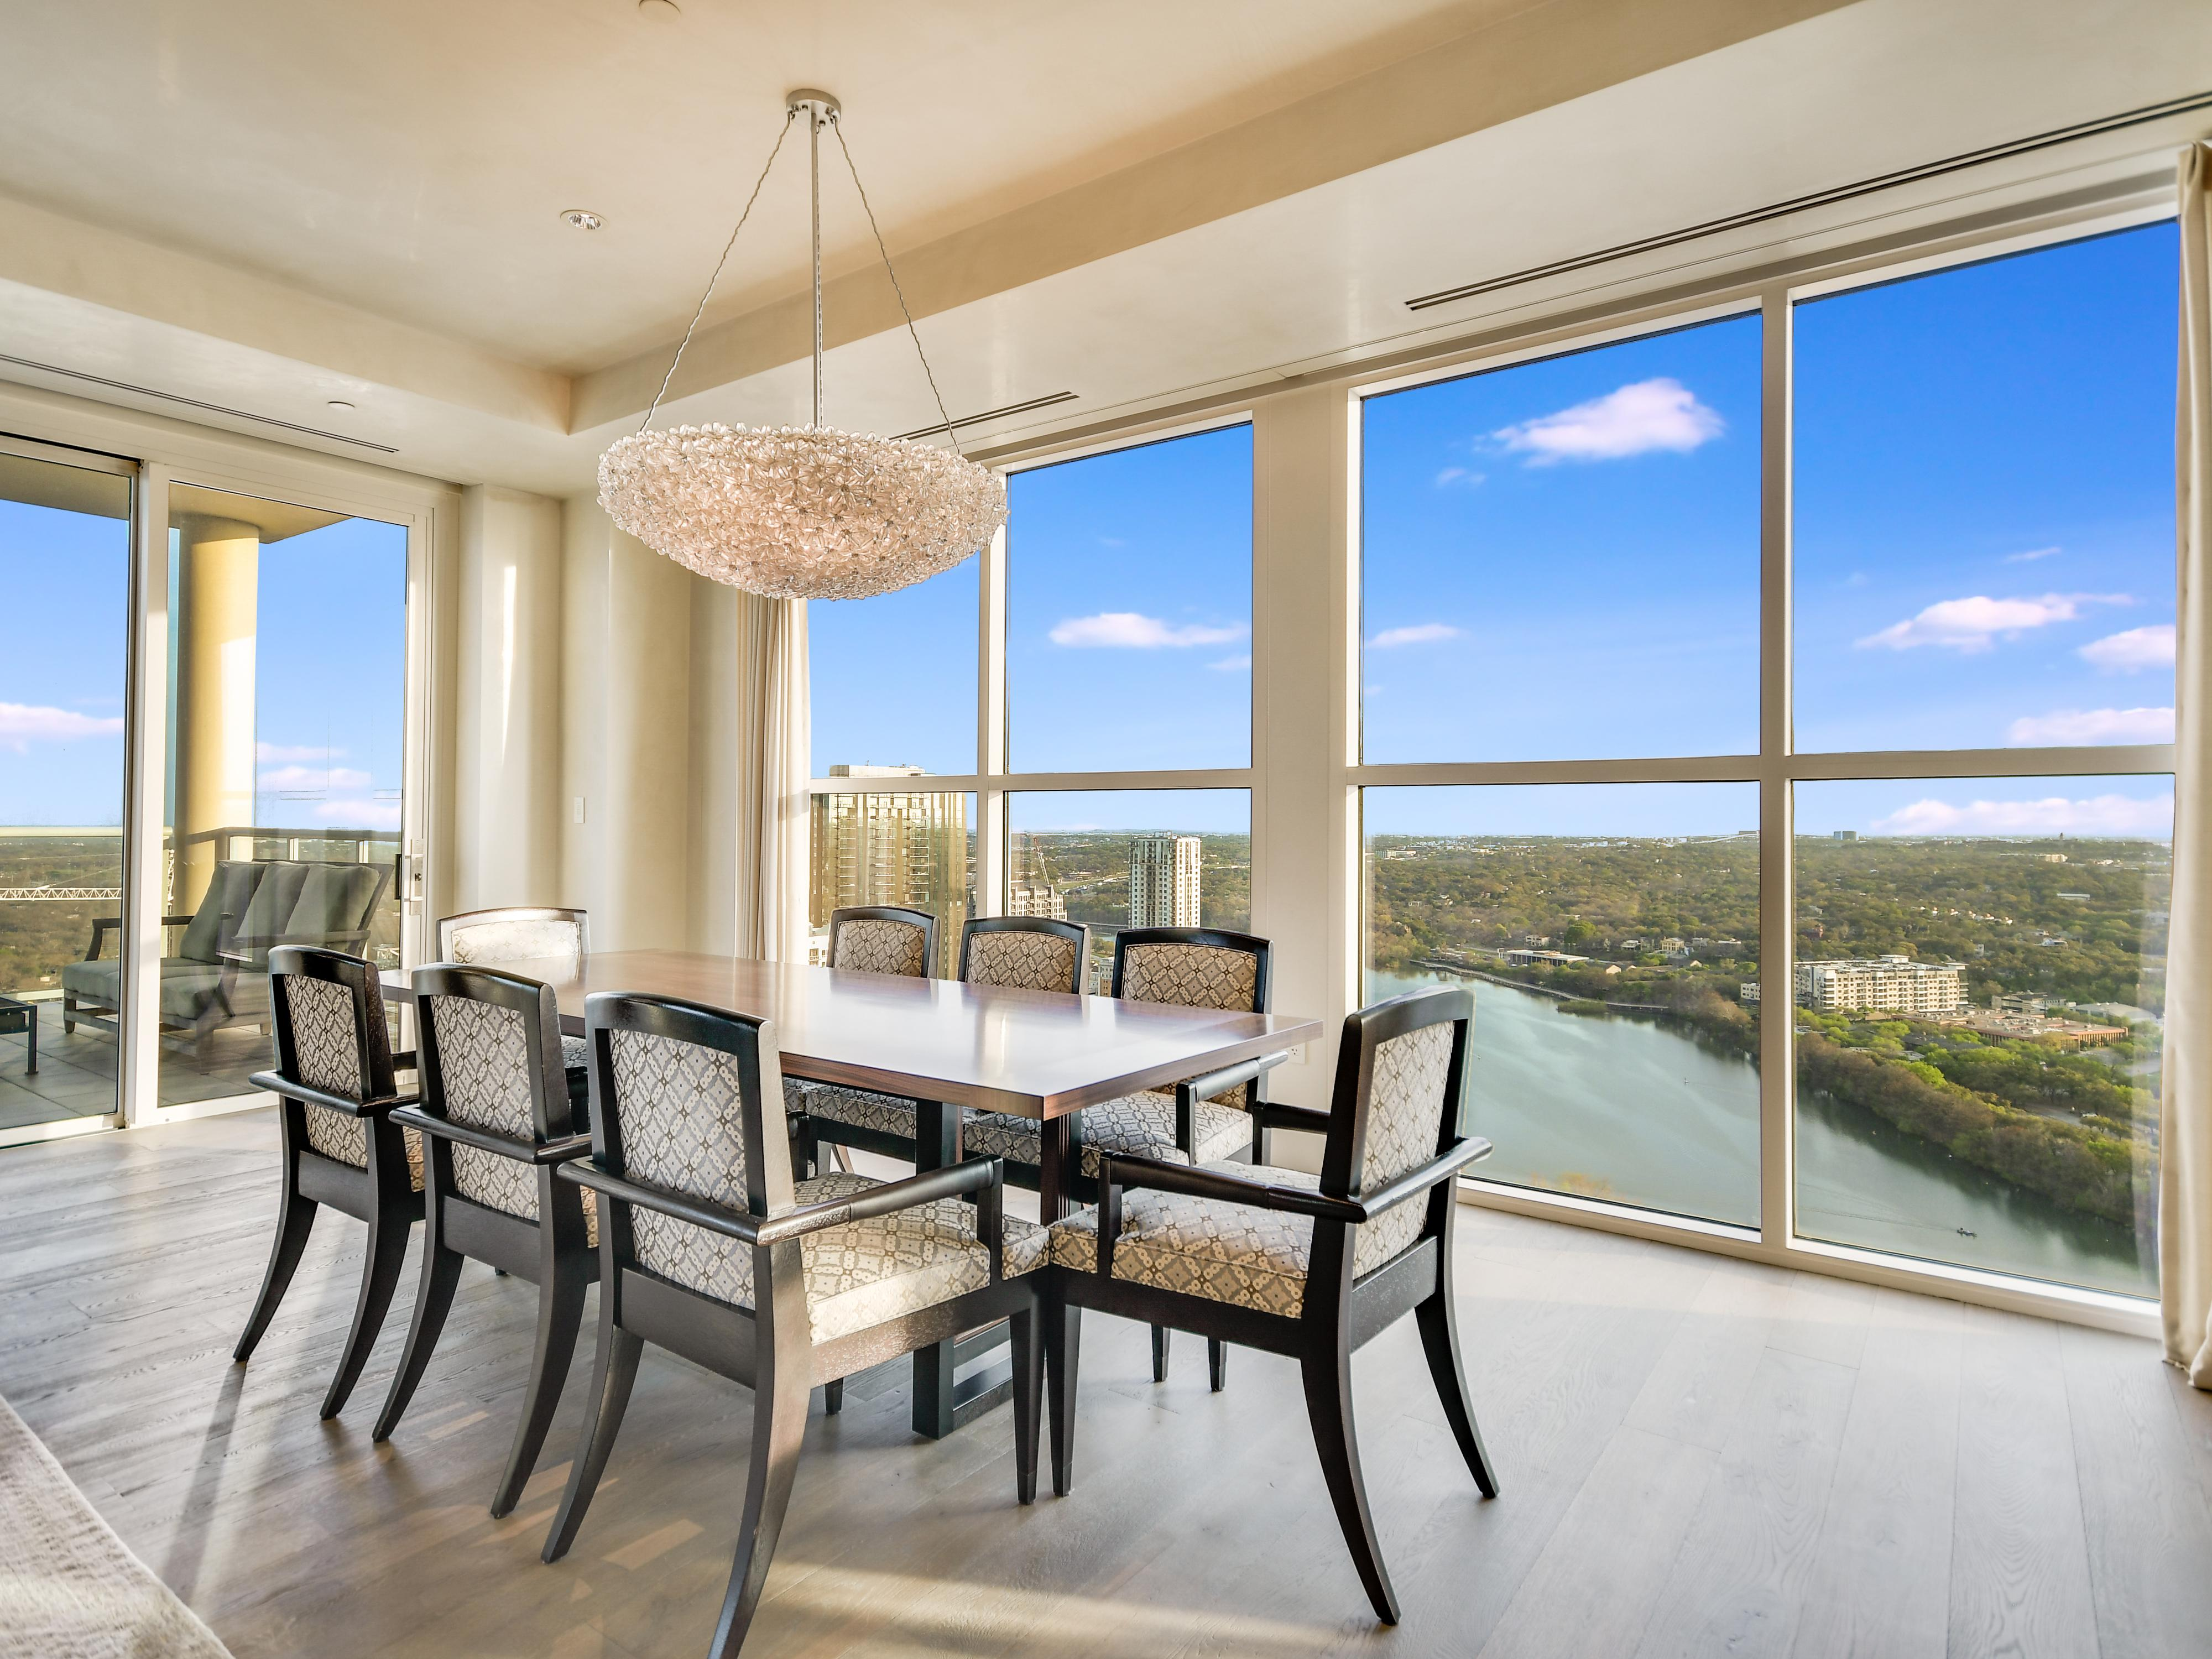 98 San Jacinto Boulevard, 30th Floor Penthouse